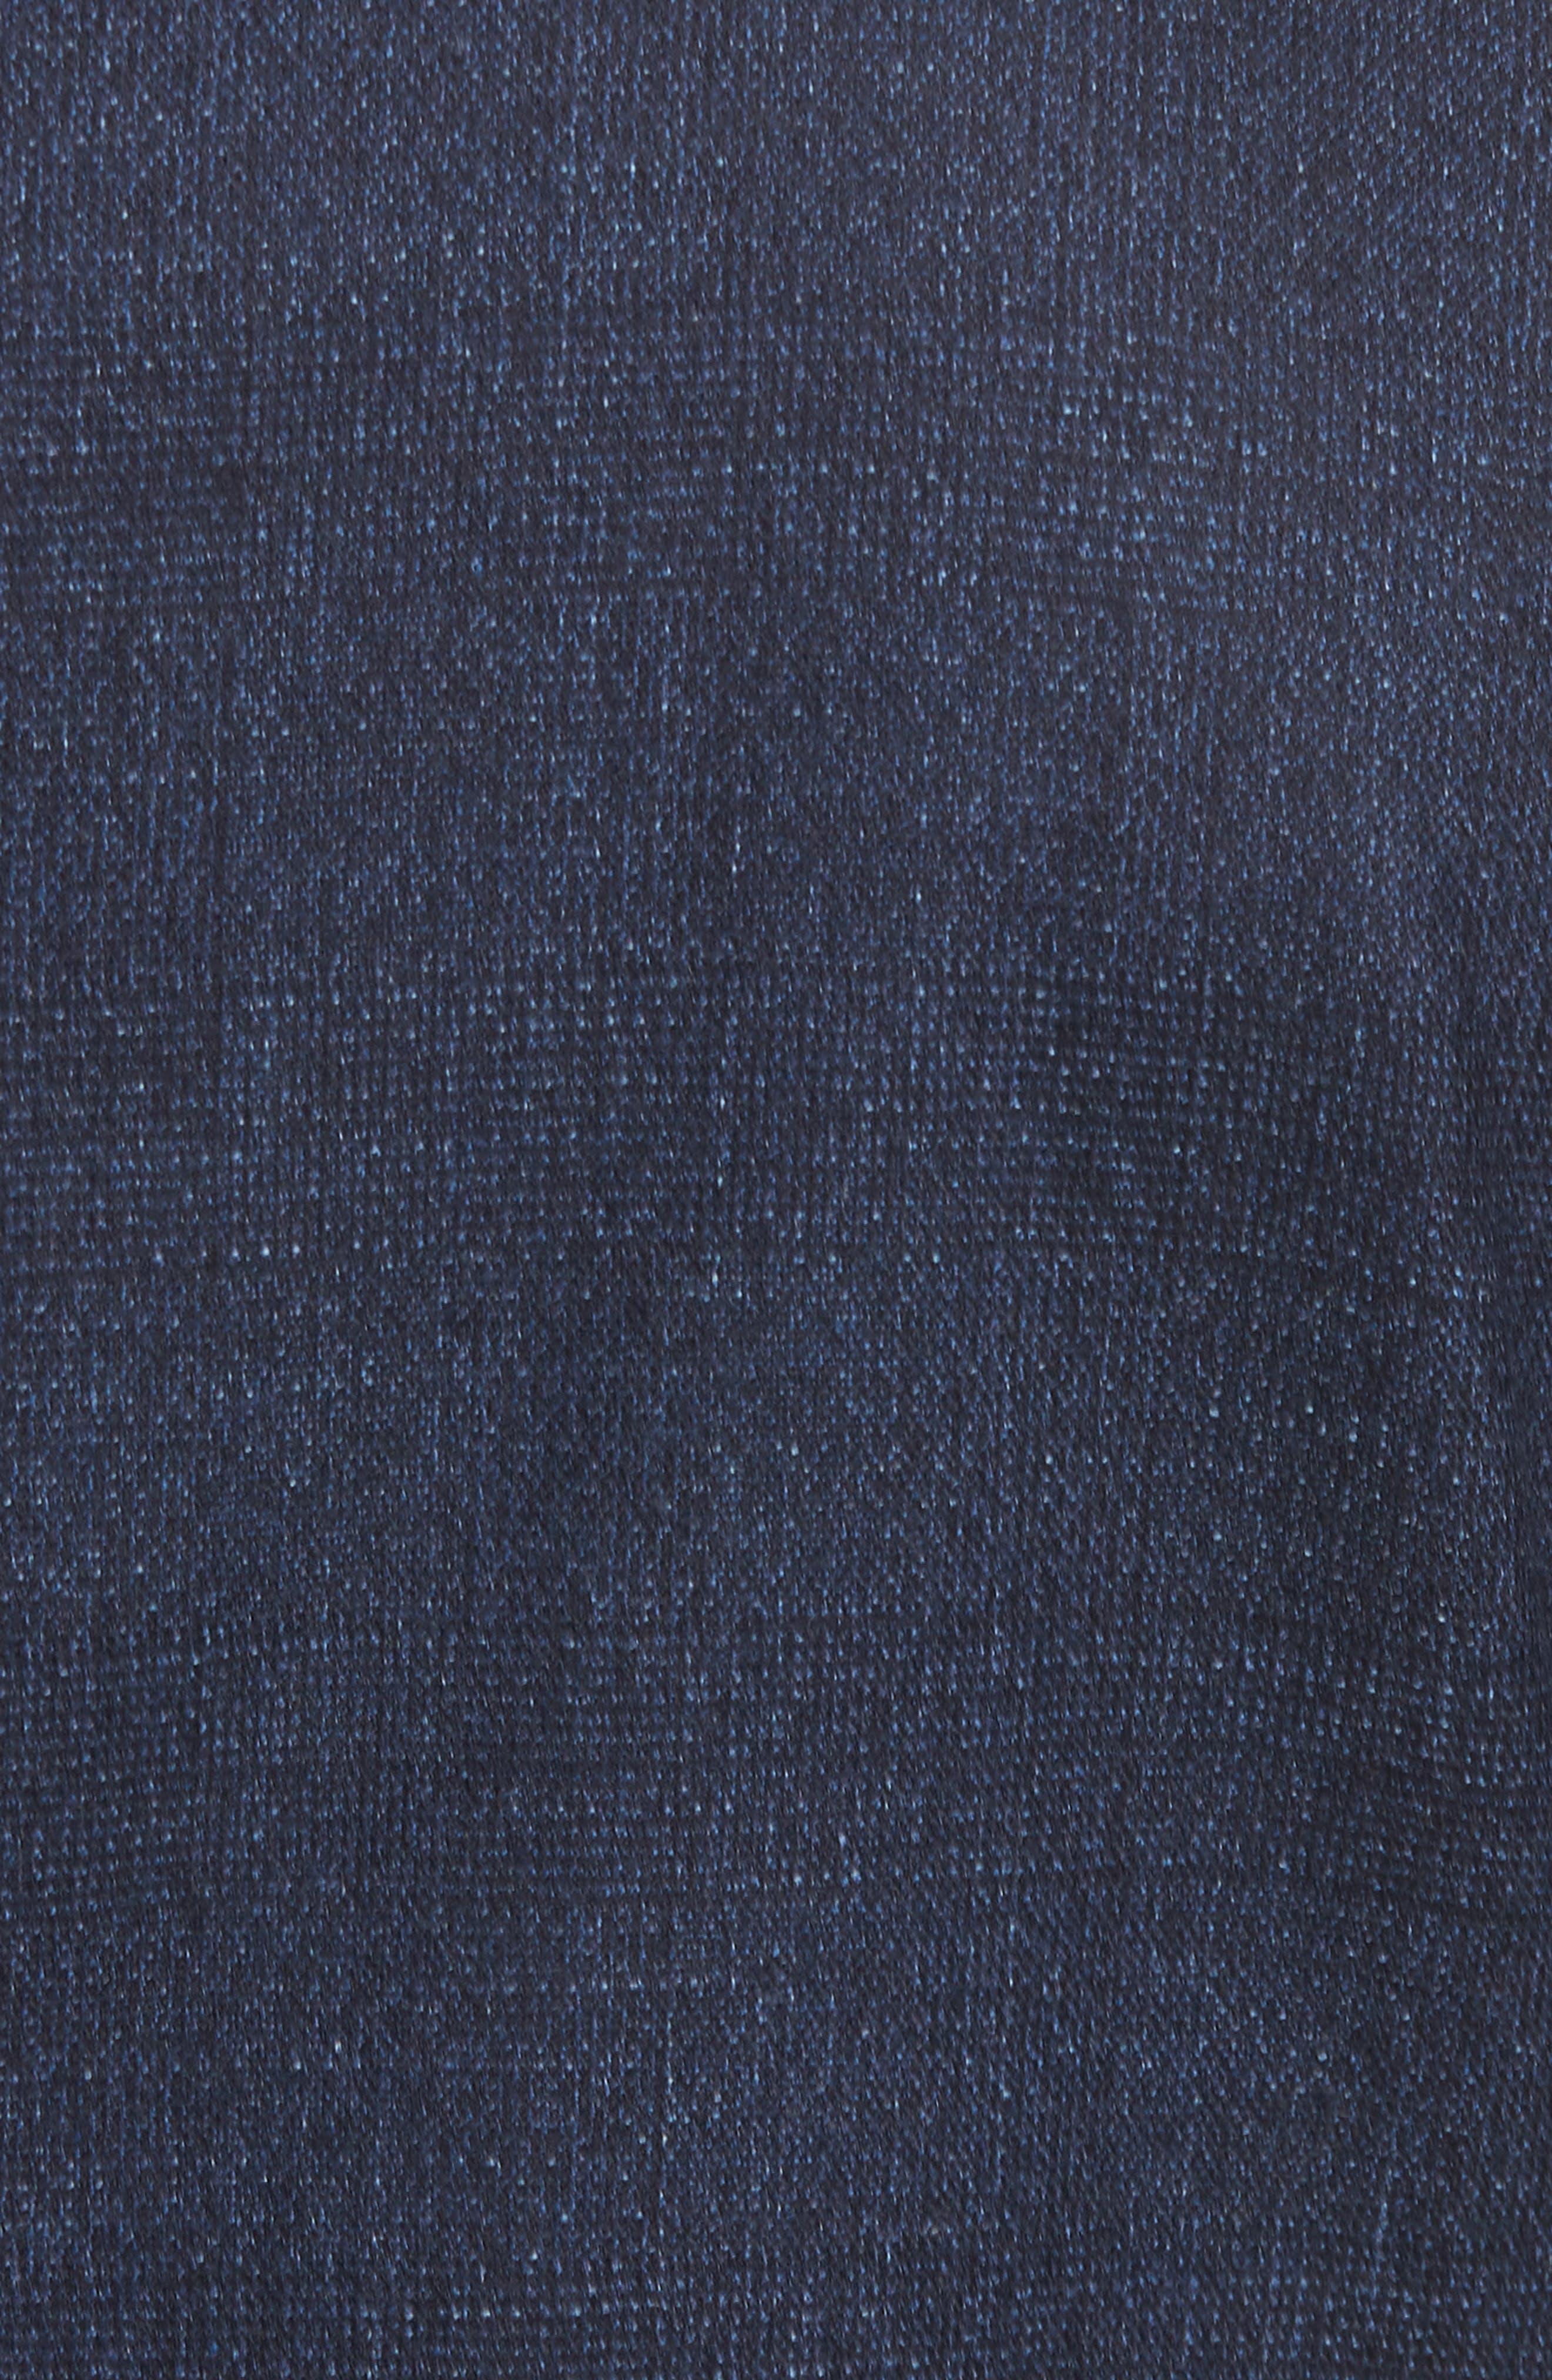 Dannevirk Ghost Check Stretch Wool Blend Blazer,                             Alternate thumbnail 6, color,                             NAVY